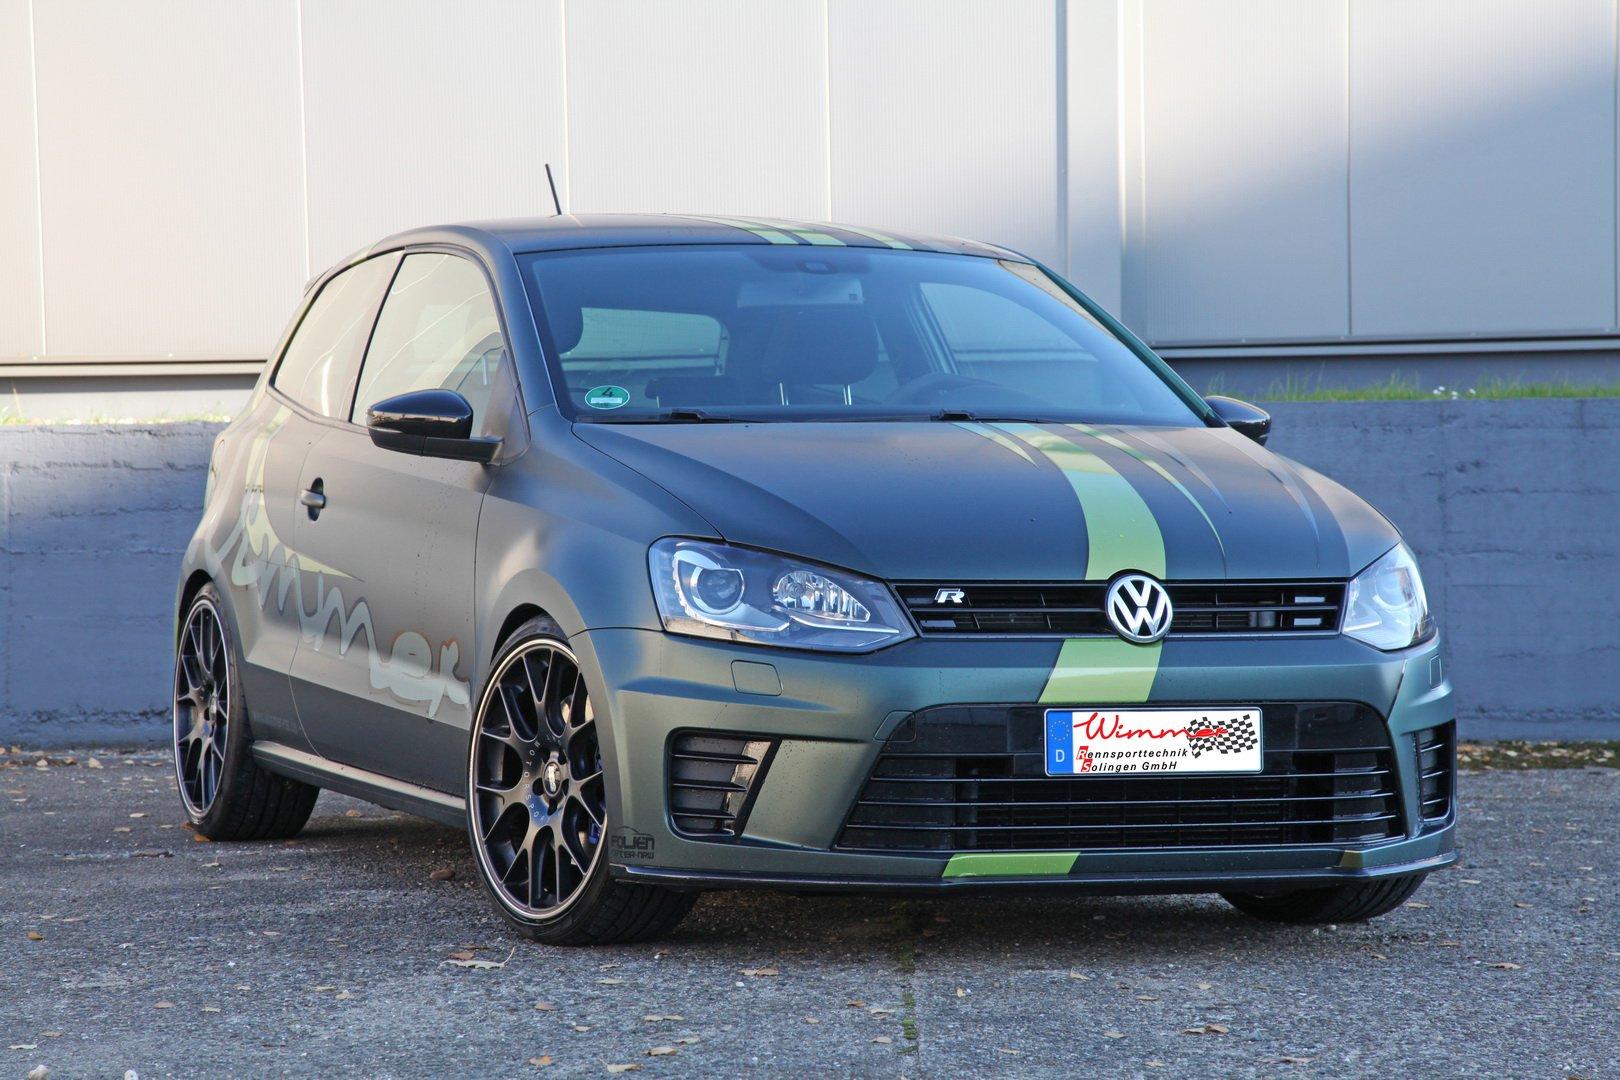 Volkswagen Polo Wrc Wimmer Dm 8